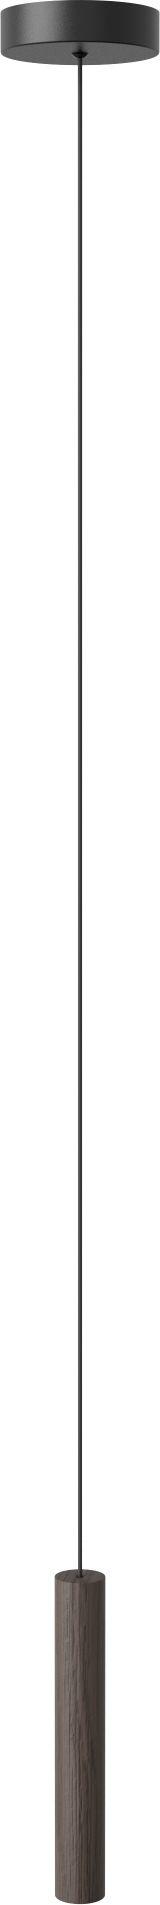 Lampa wisząca Chimes 2167 VITA copenhagen drewniana lampa wisząca